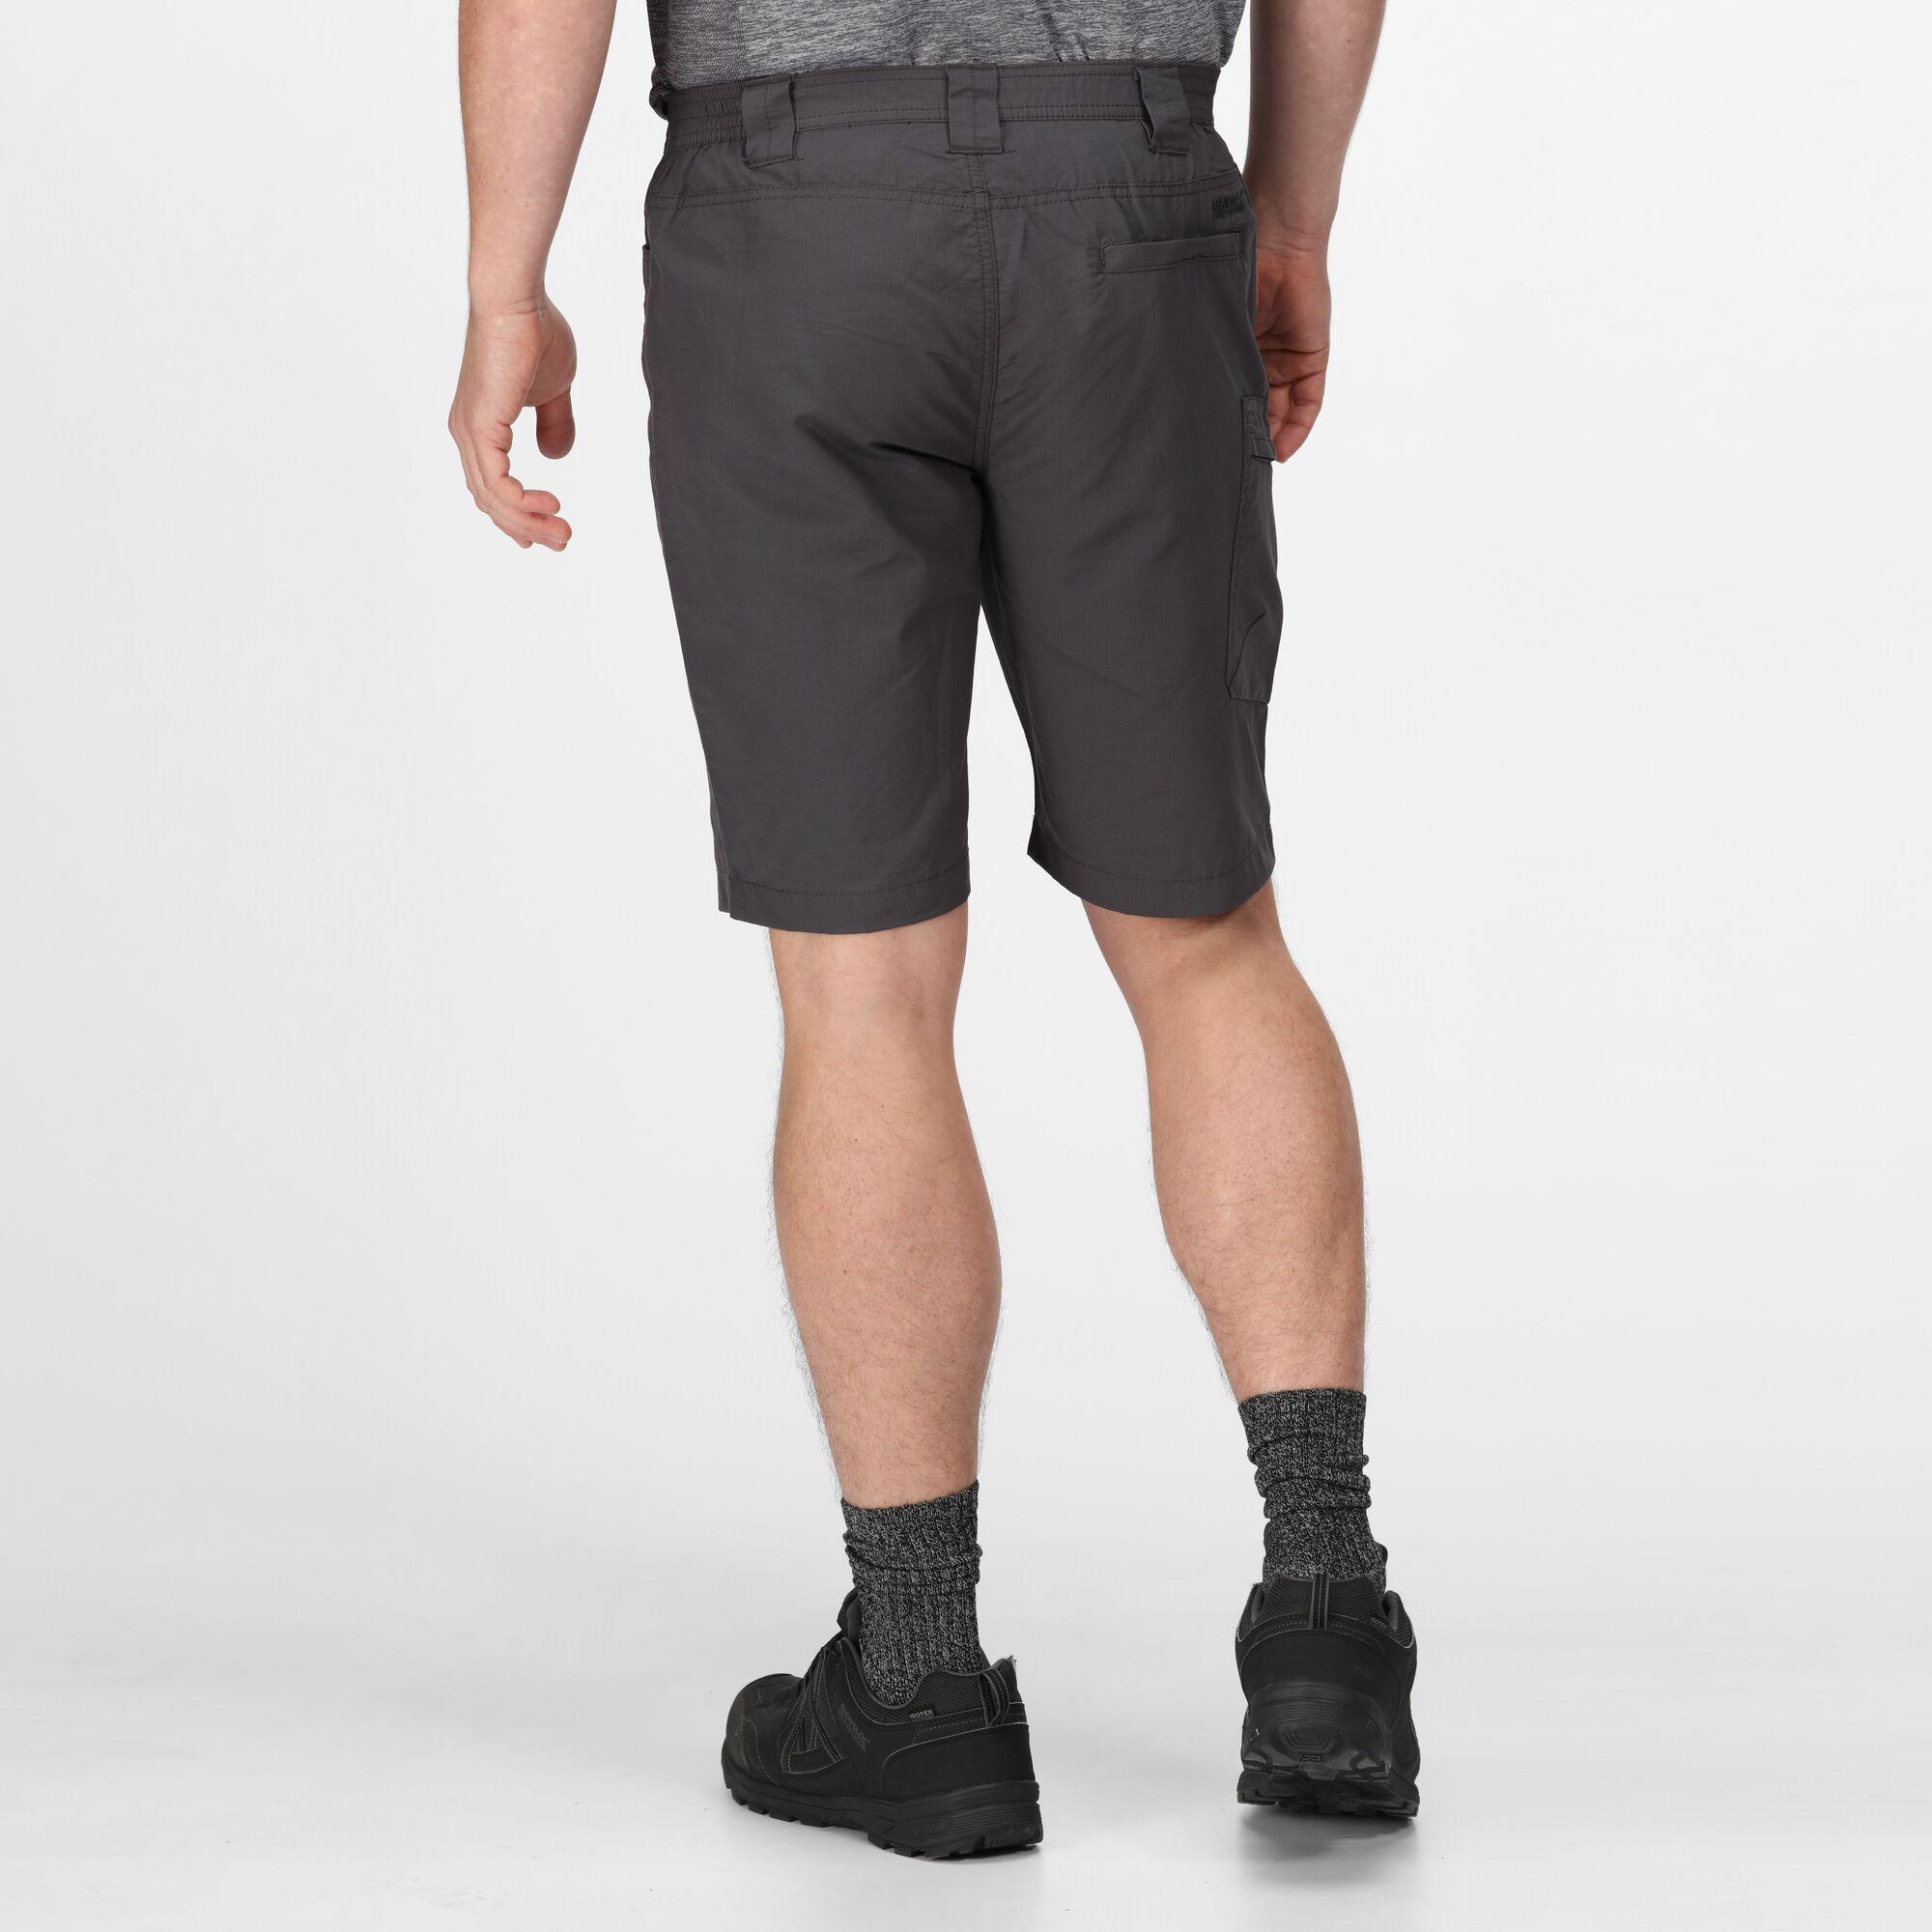 Regatta Men/'s Salvator Coolweave Cotton Walking Shorts Seal Grey